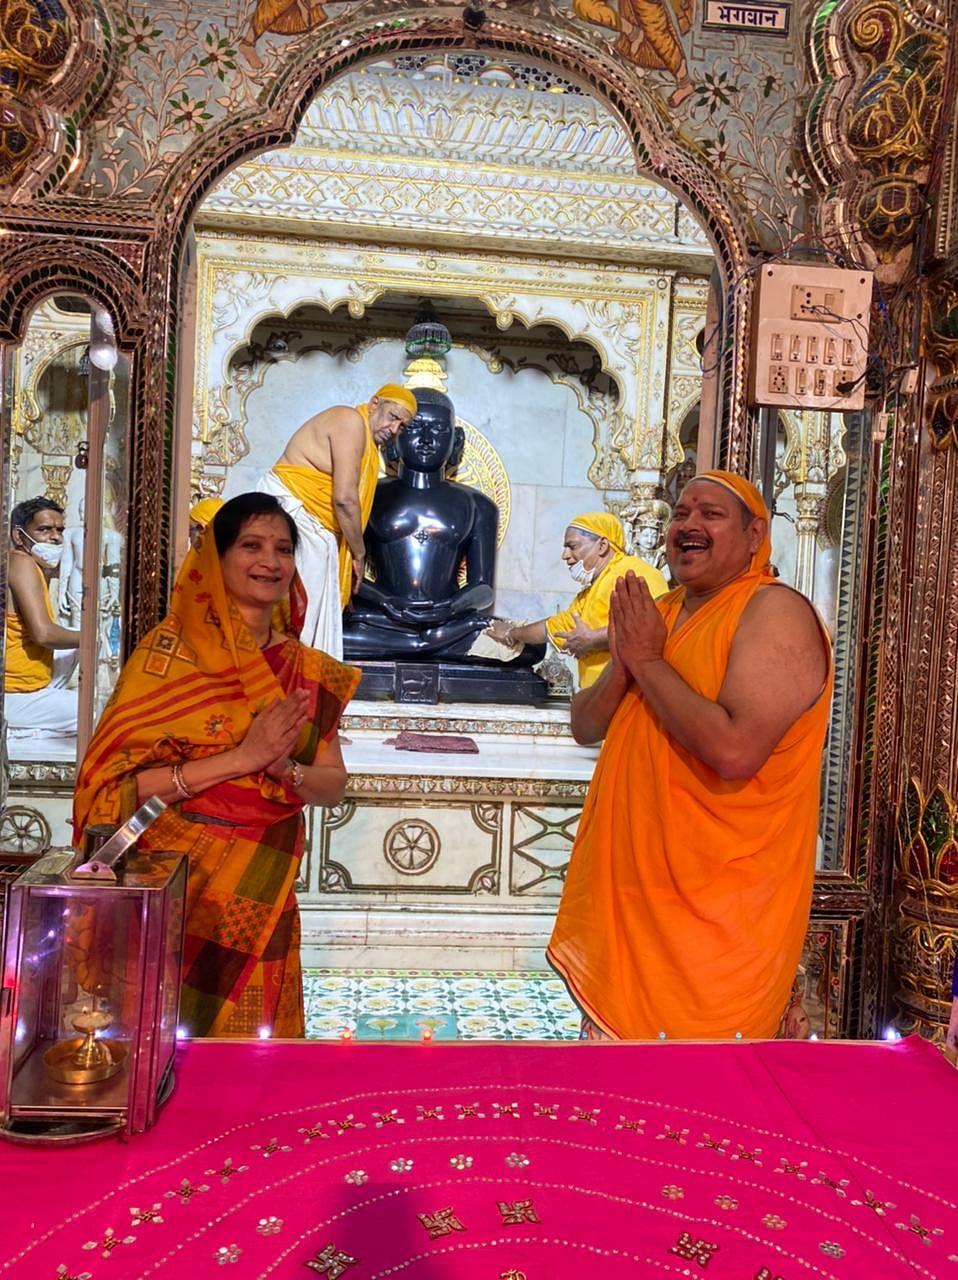 Indore: Centenary of Kaanch Mandir's saga